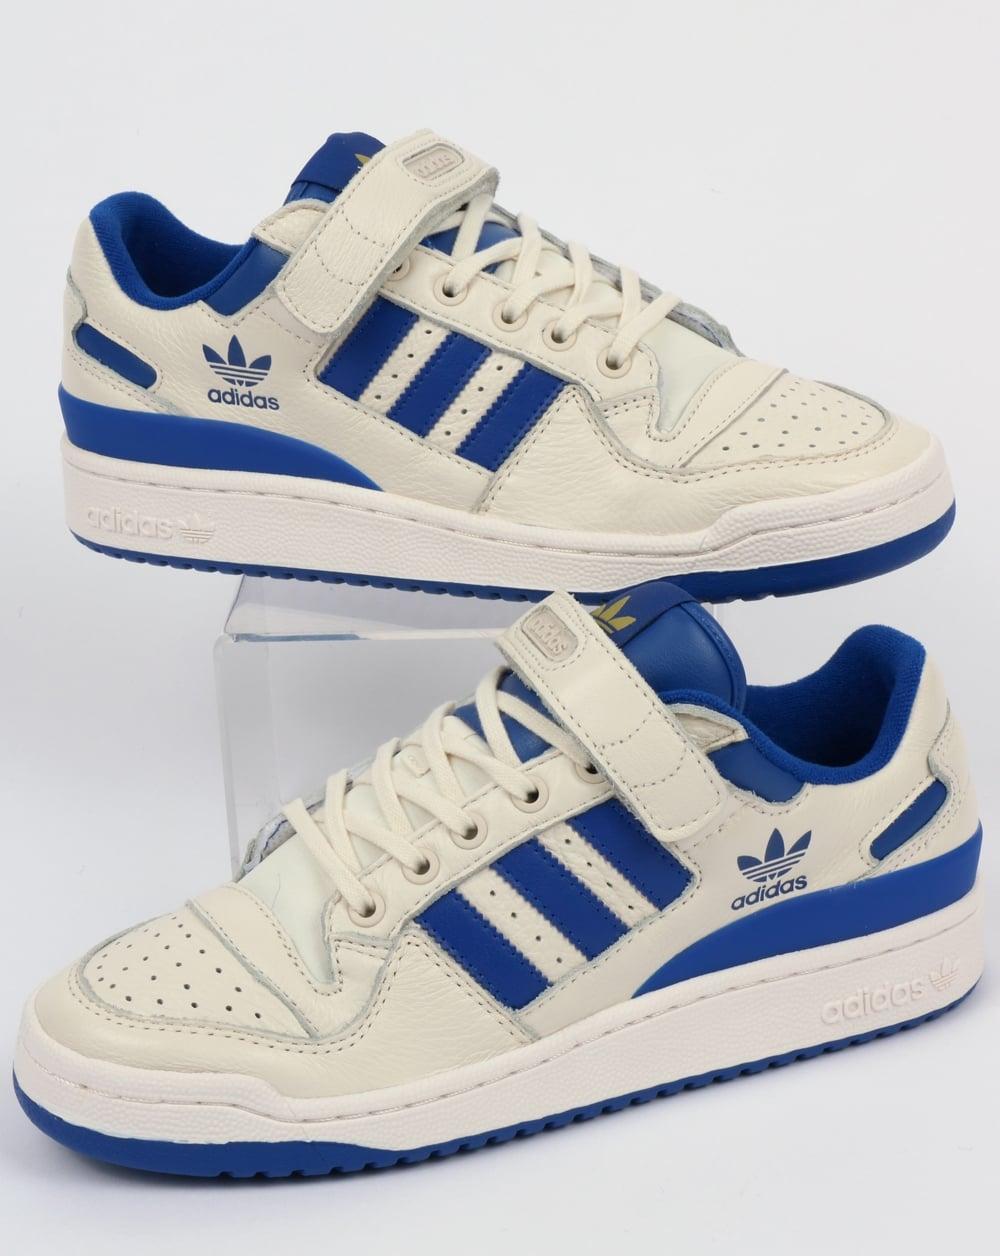 4fa59c9497eea1 adidas Trainers Adidas Forum Lo Trainers White Royal